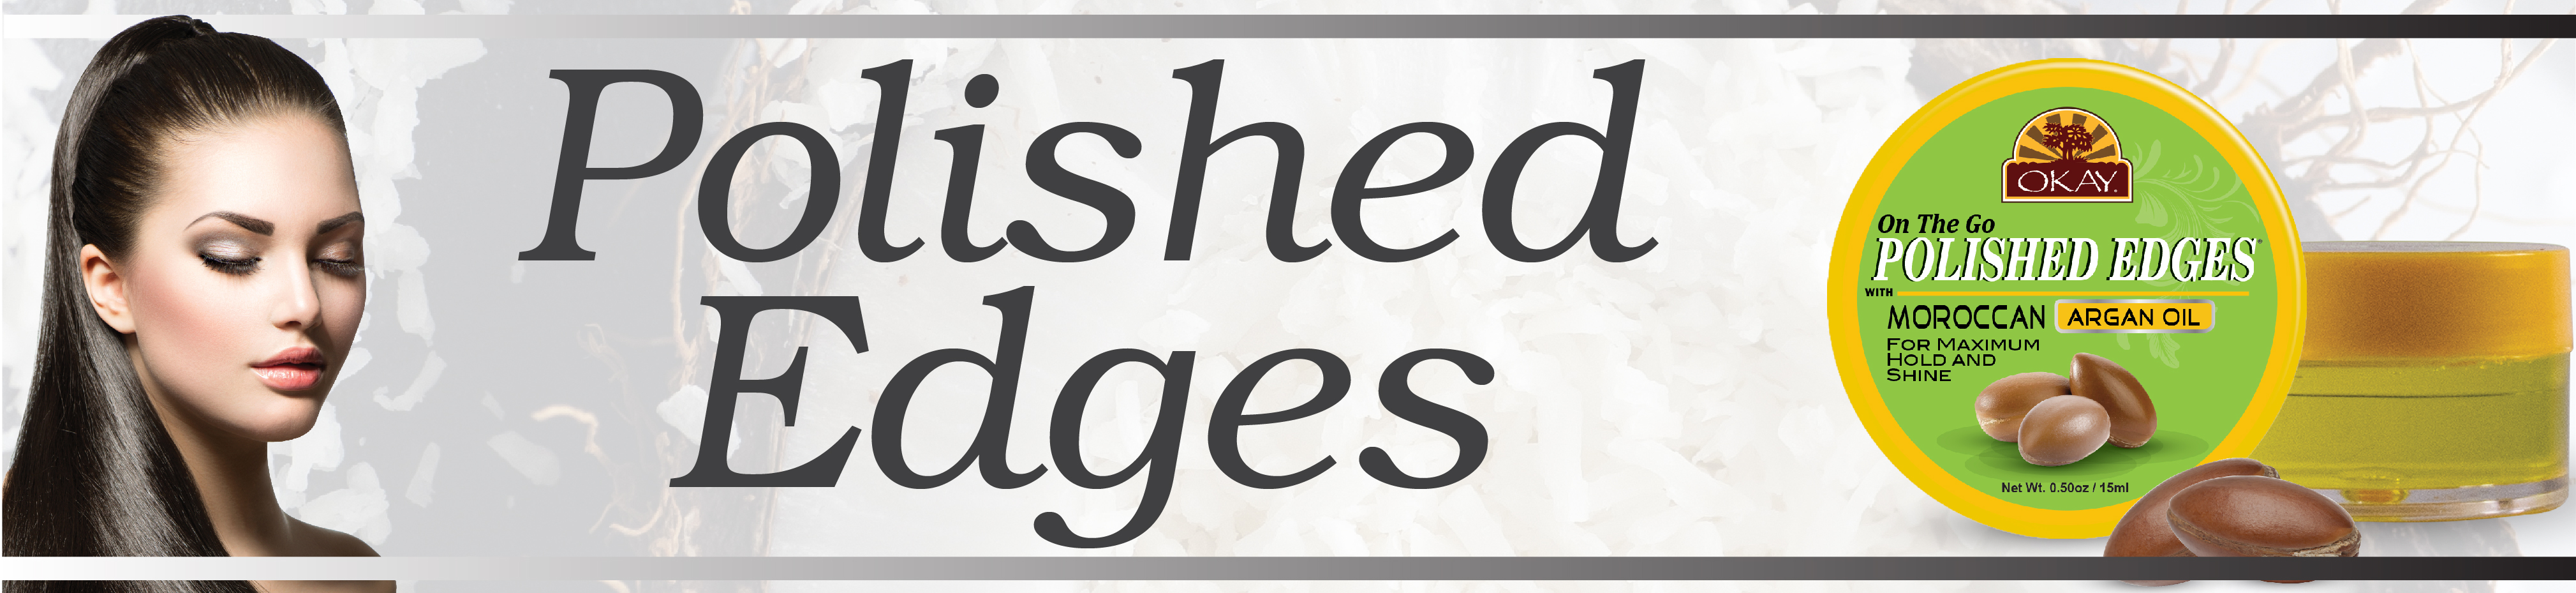 polished-edges-18-18.jpg